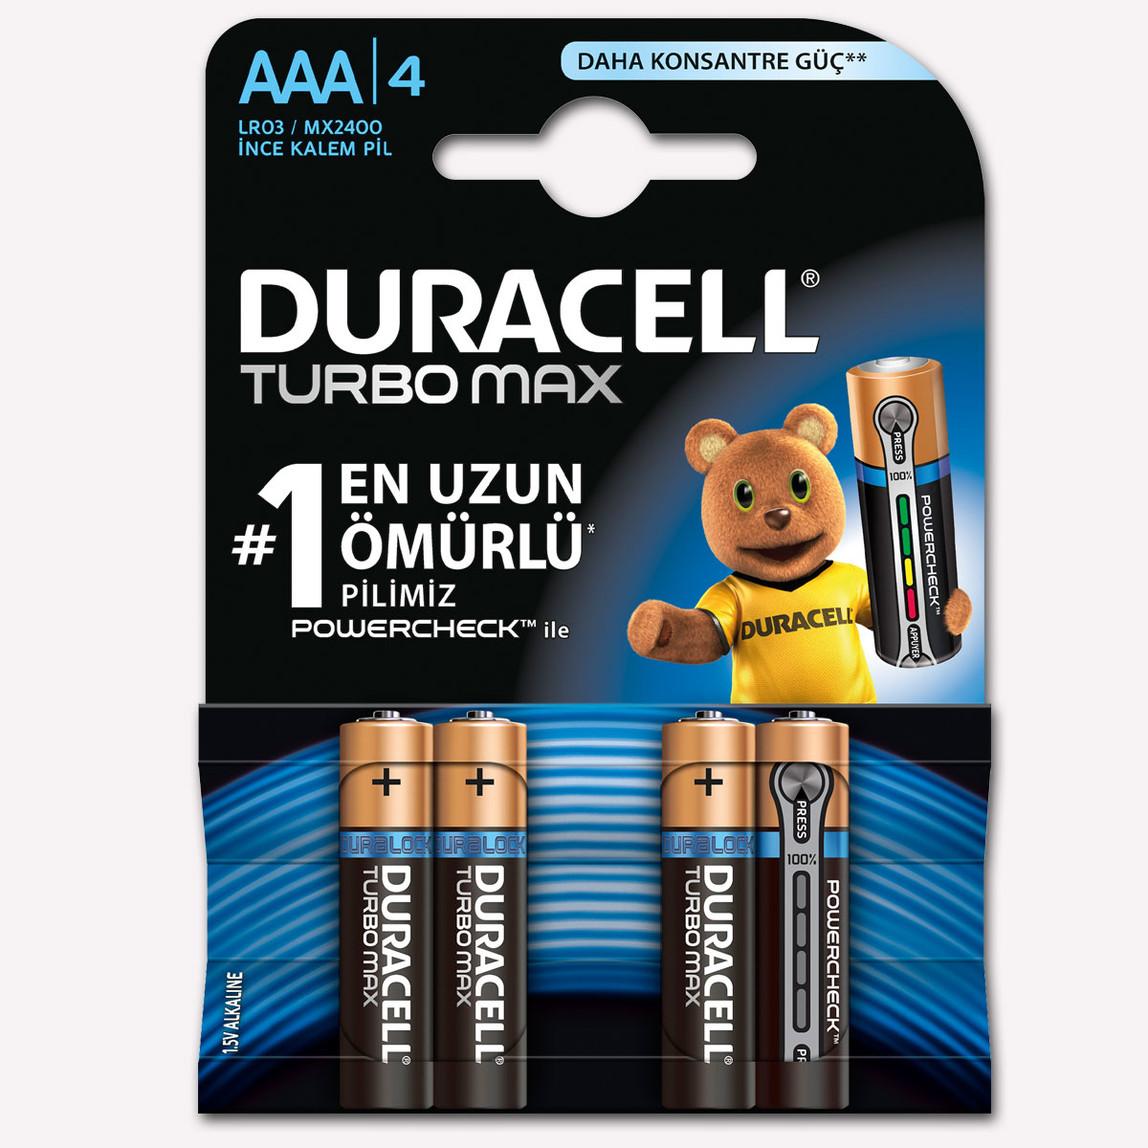 Duracell AAA Kalem Pil Alkalin Turbo Max 4'lü Paket